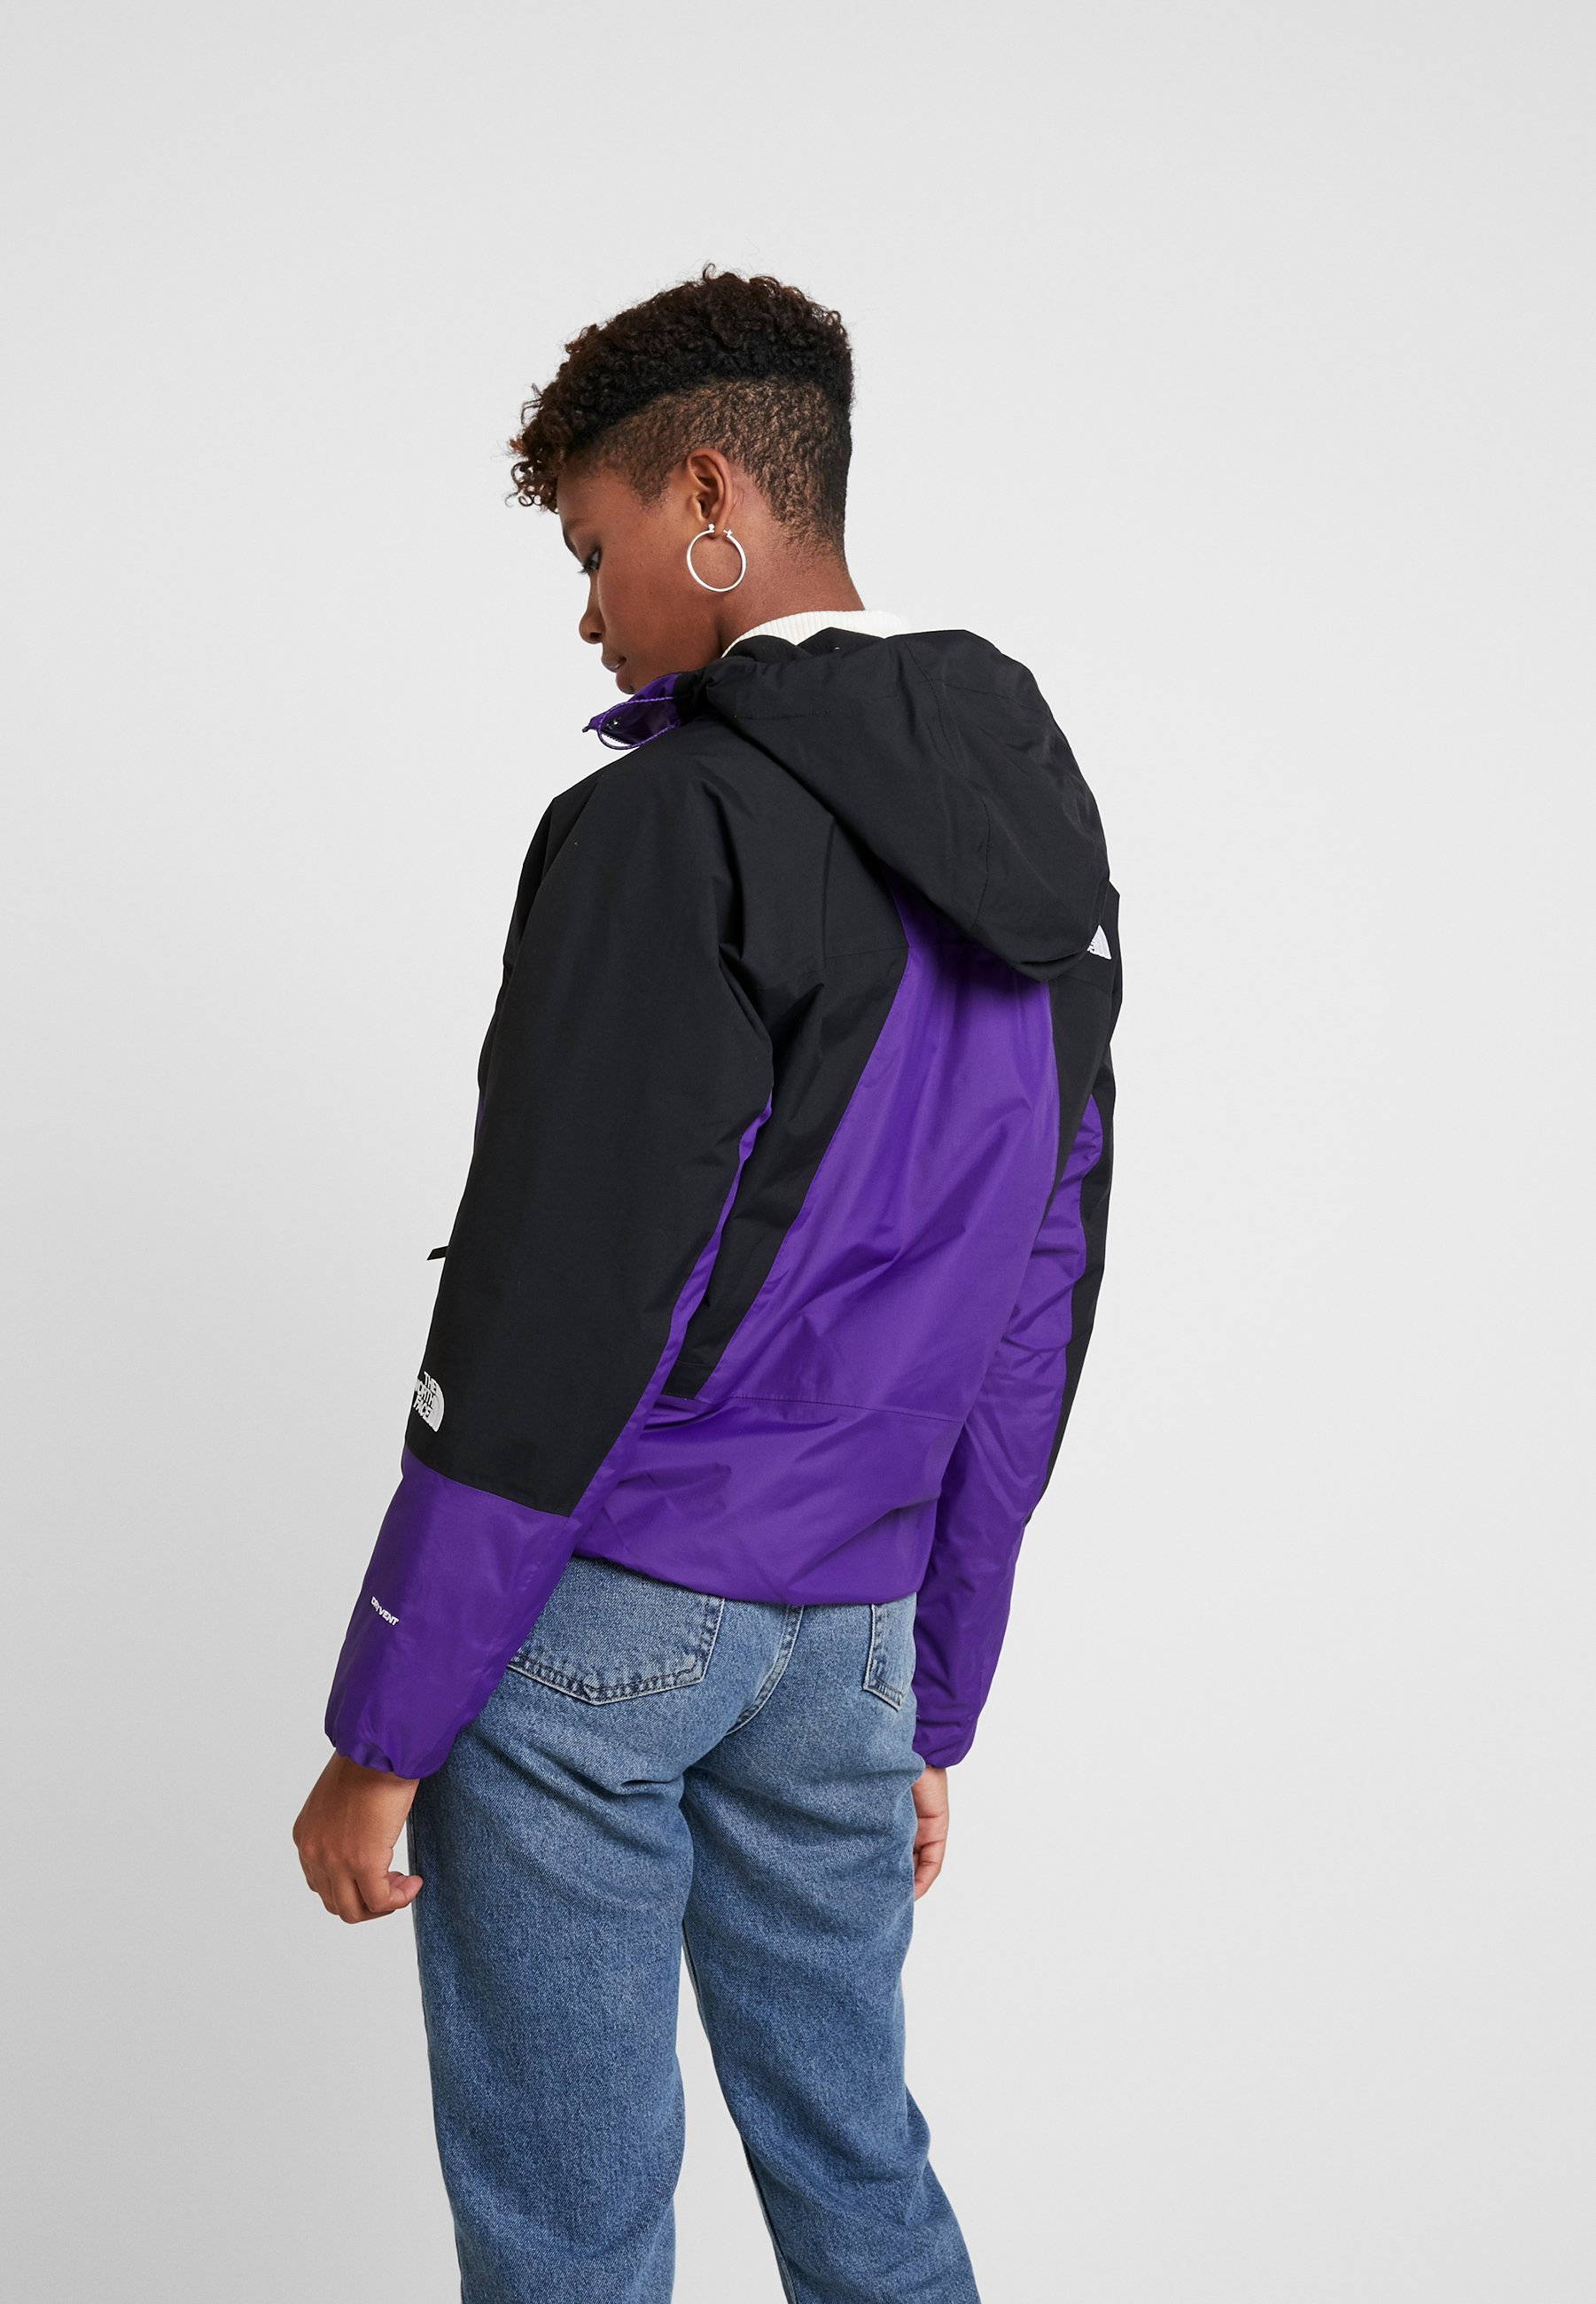 The North LightDoudoune Face Hero Purple black If6b7gYyv